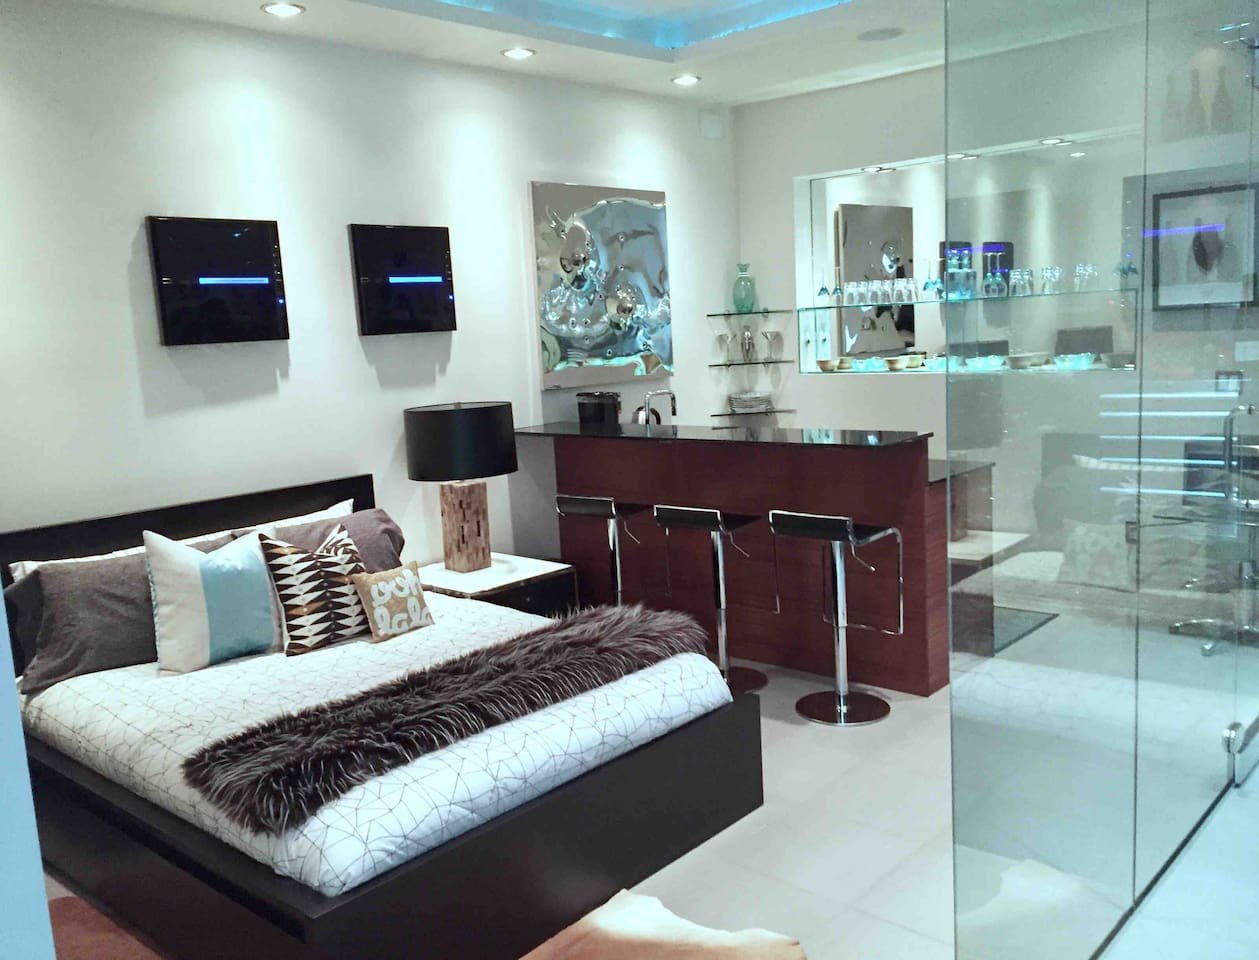 Bedroom, bar, kitchen, wine cellar gallery